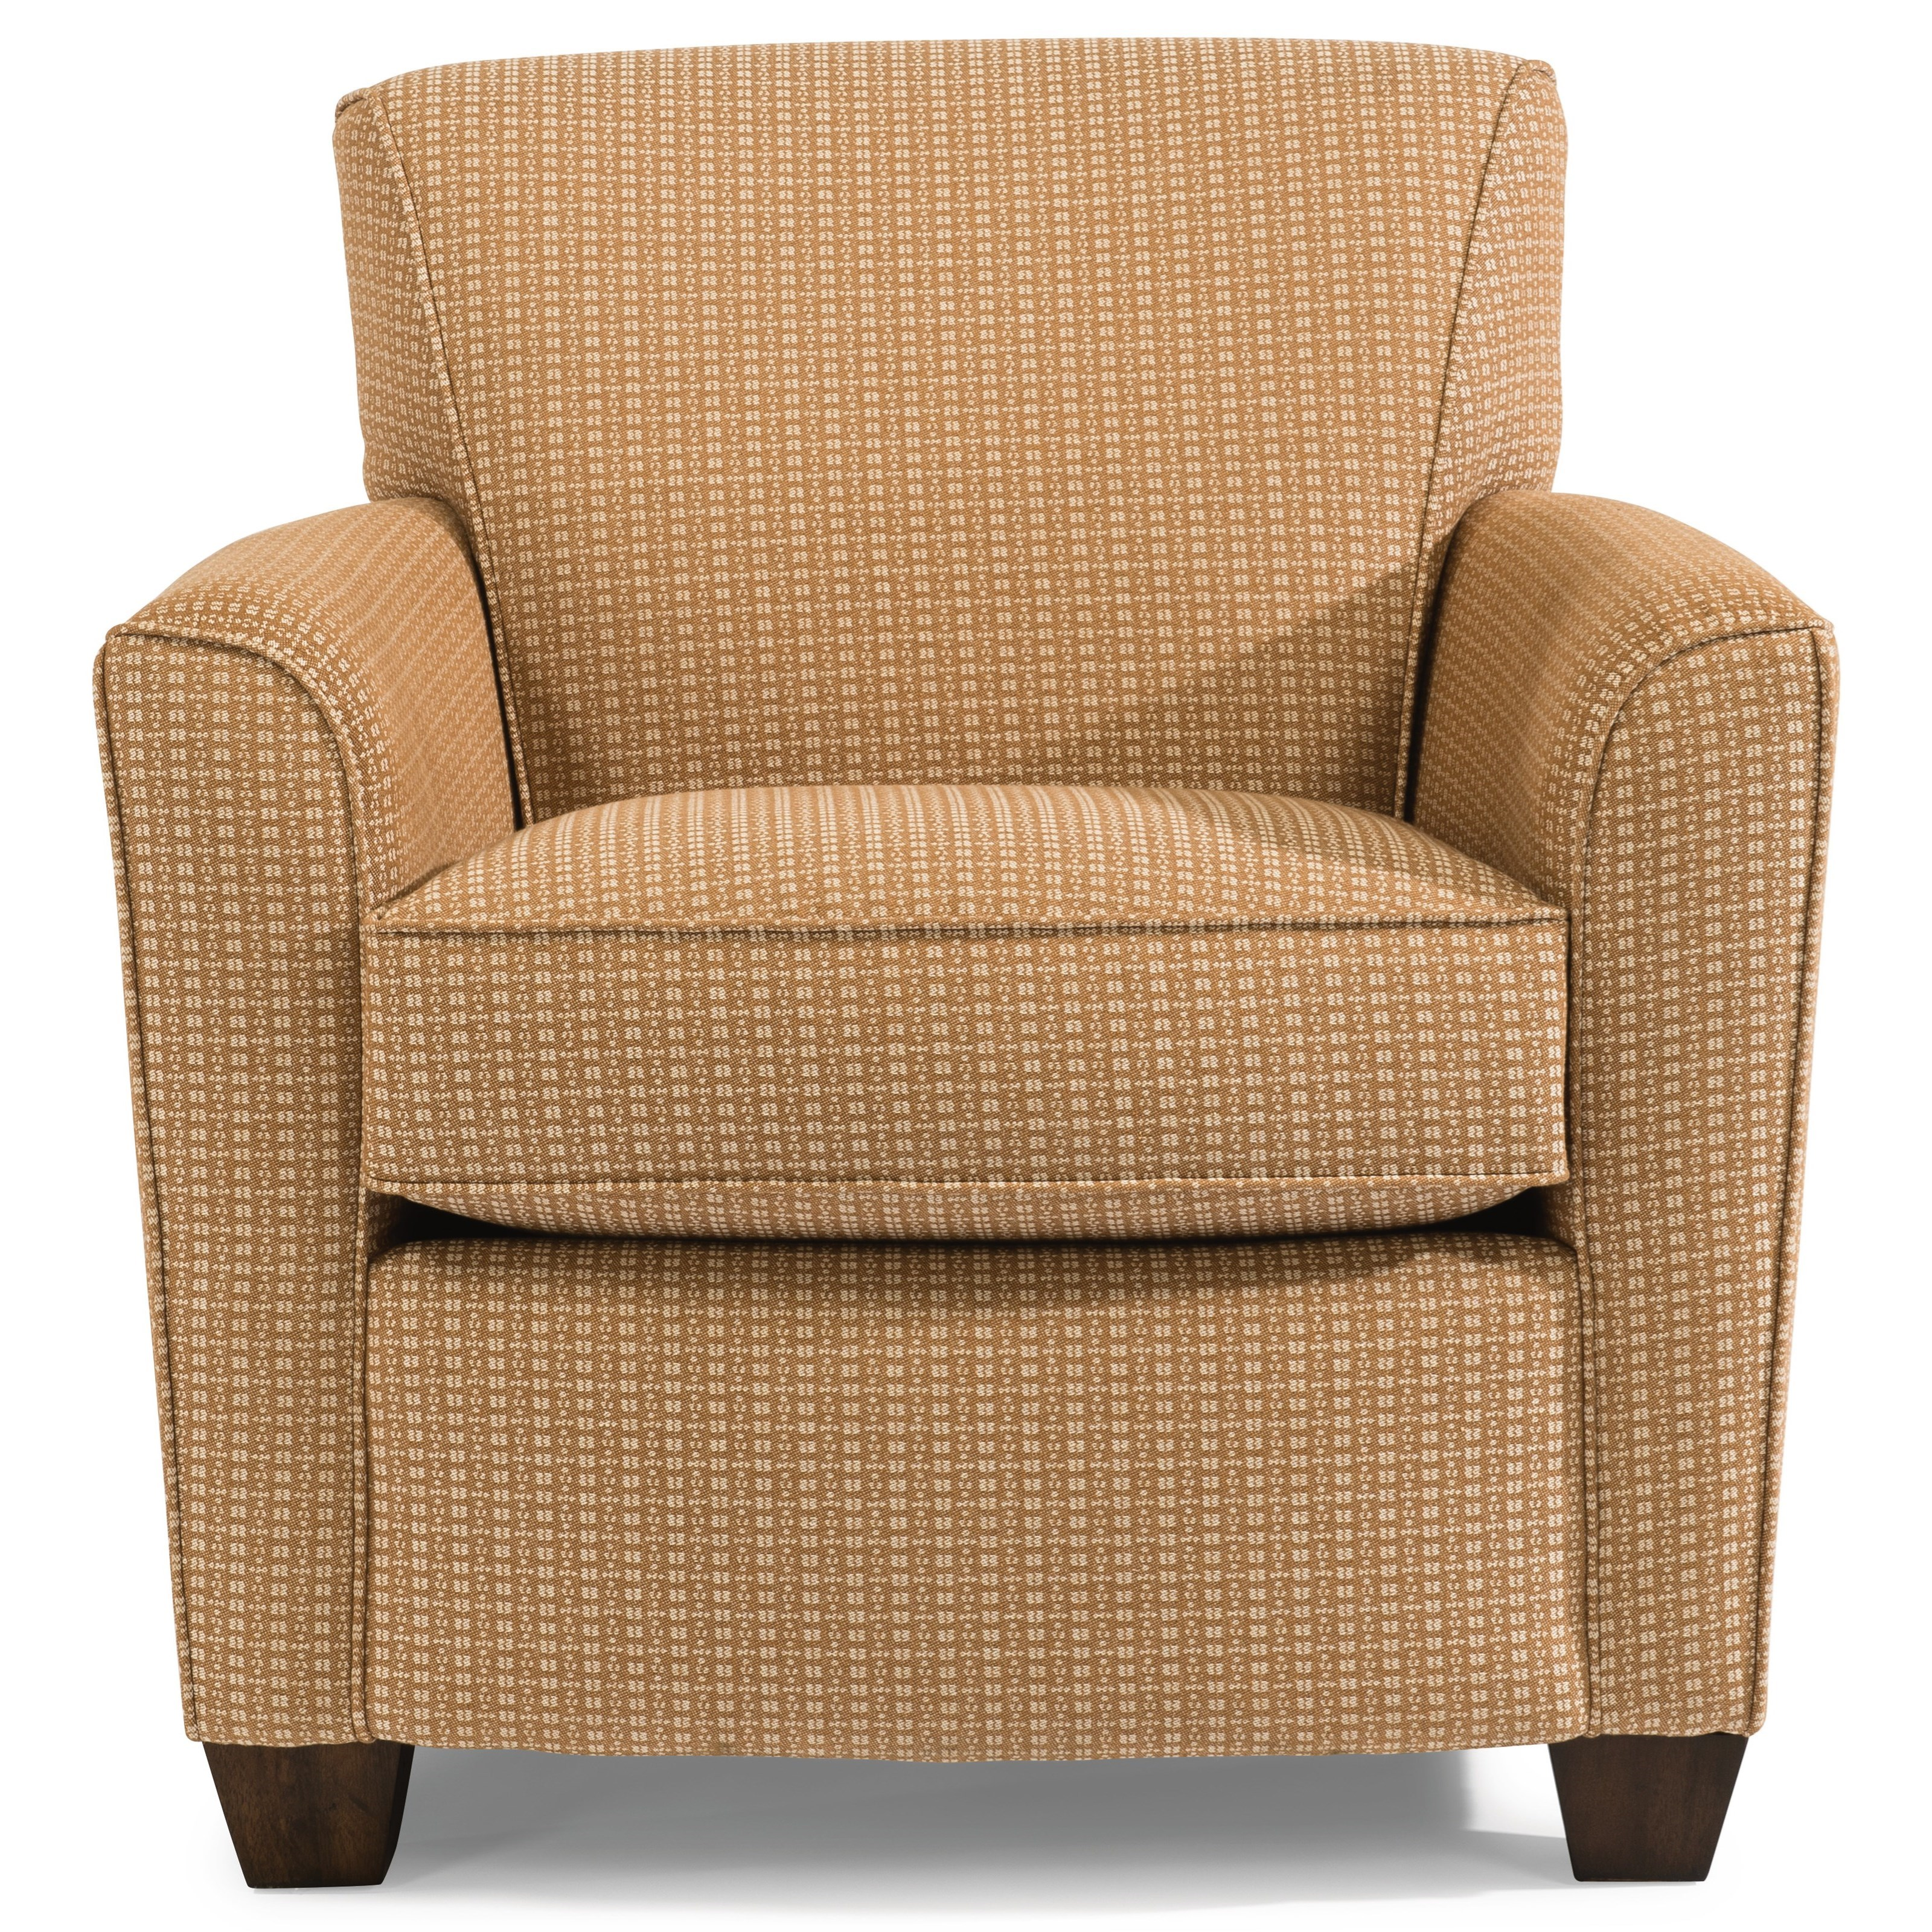 Kingman Chair by Flexsteel at Steger's Furniture